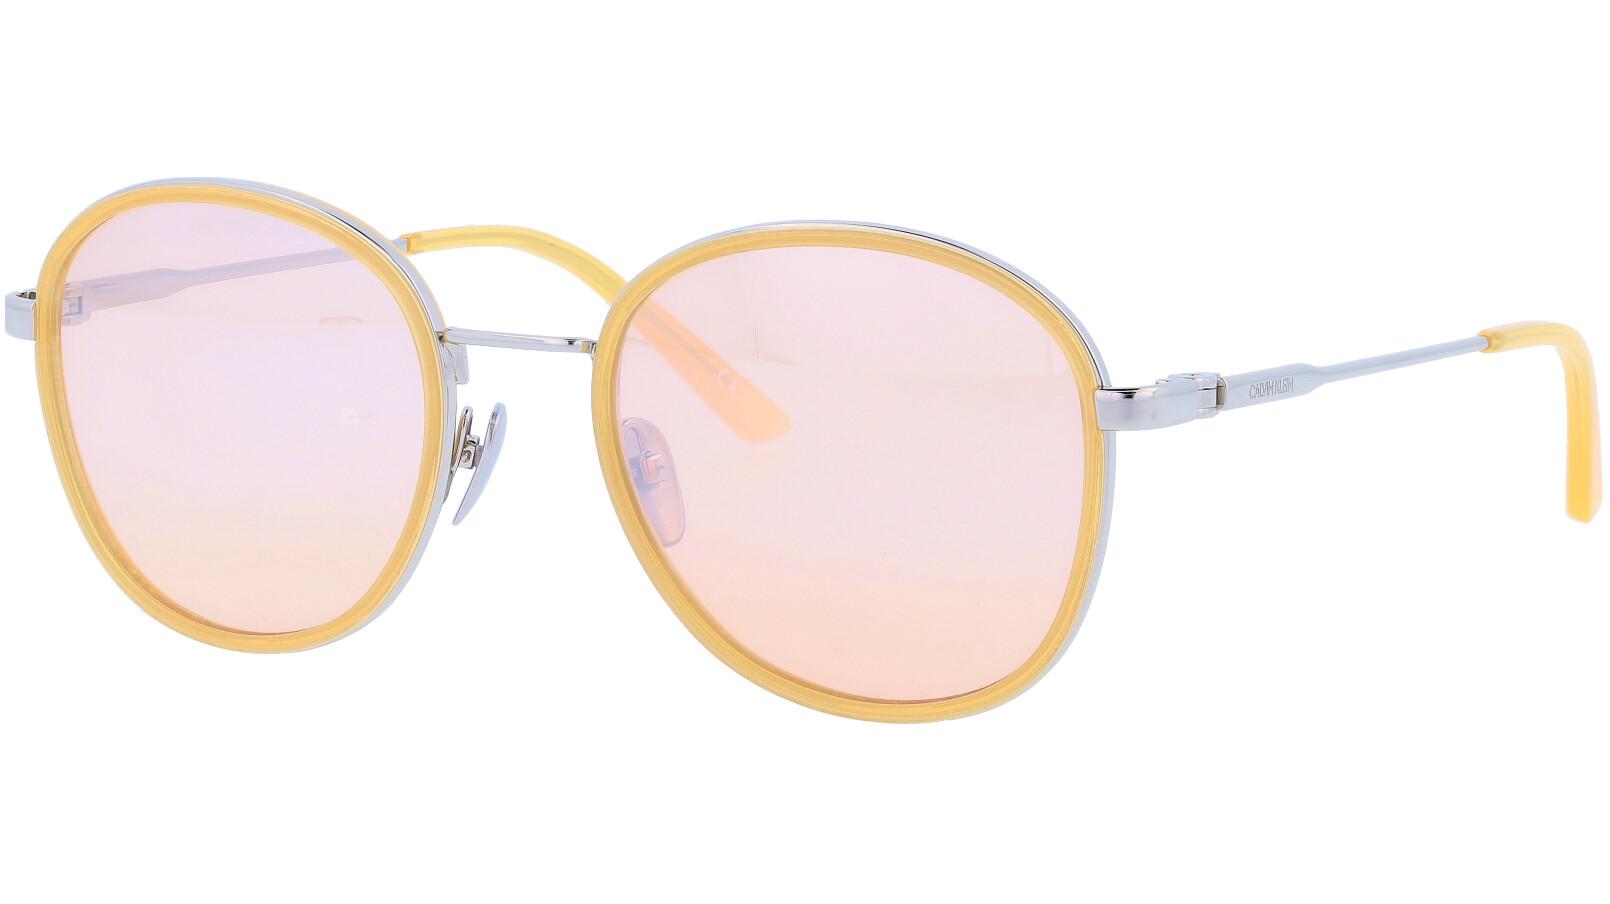 CALVIN KLEIN CK18101S 870 52 PINK Sunglasses